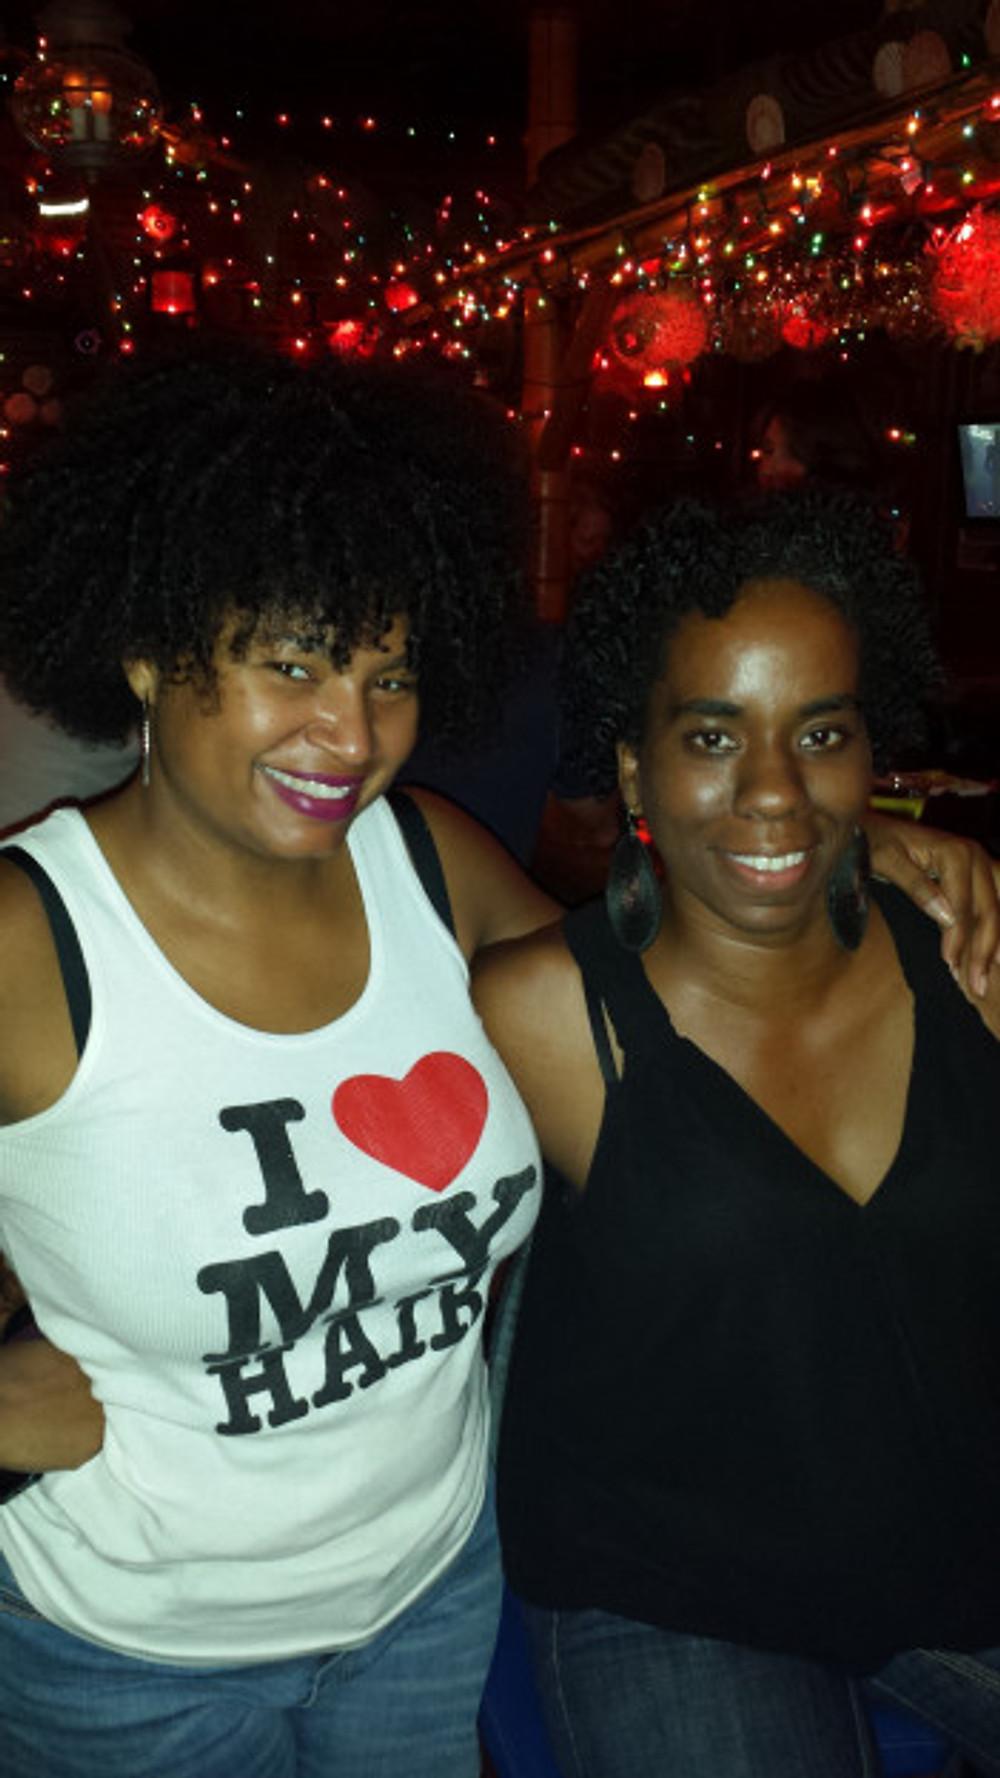 Alyscia and her friend Angela and I at a restaurant/bar in Santa Monica, CA.